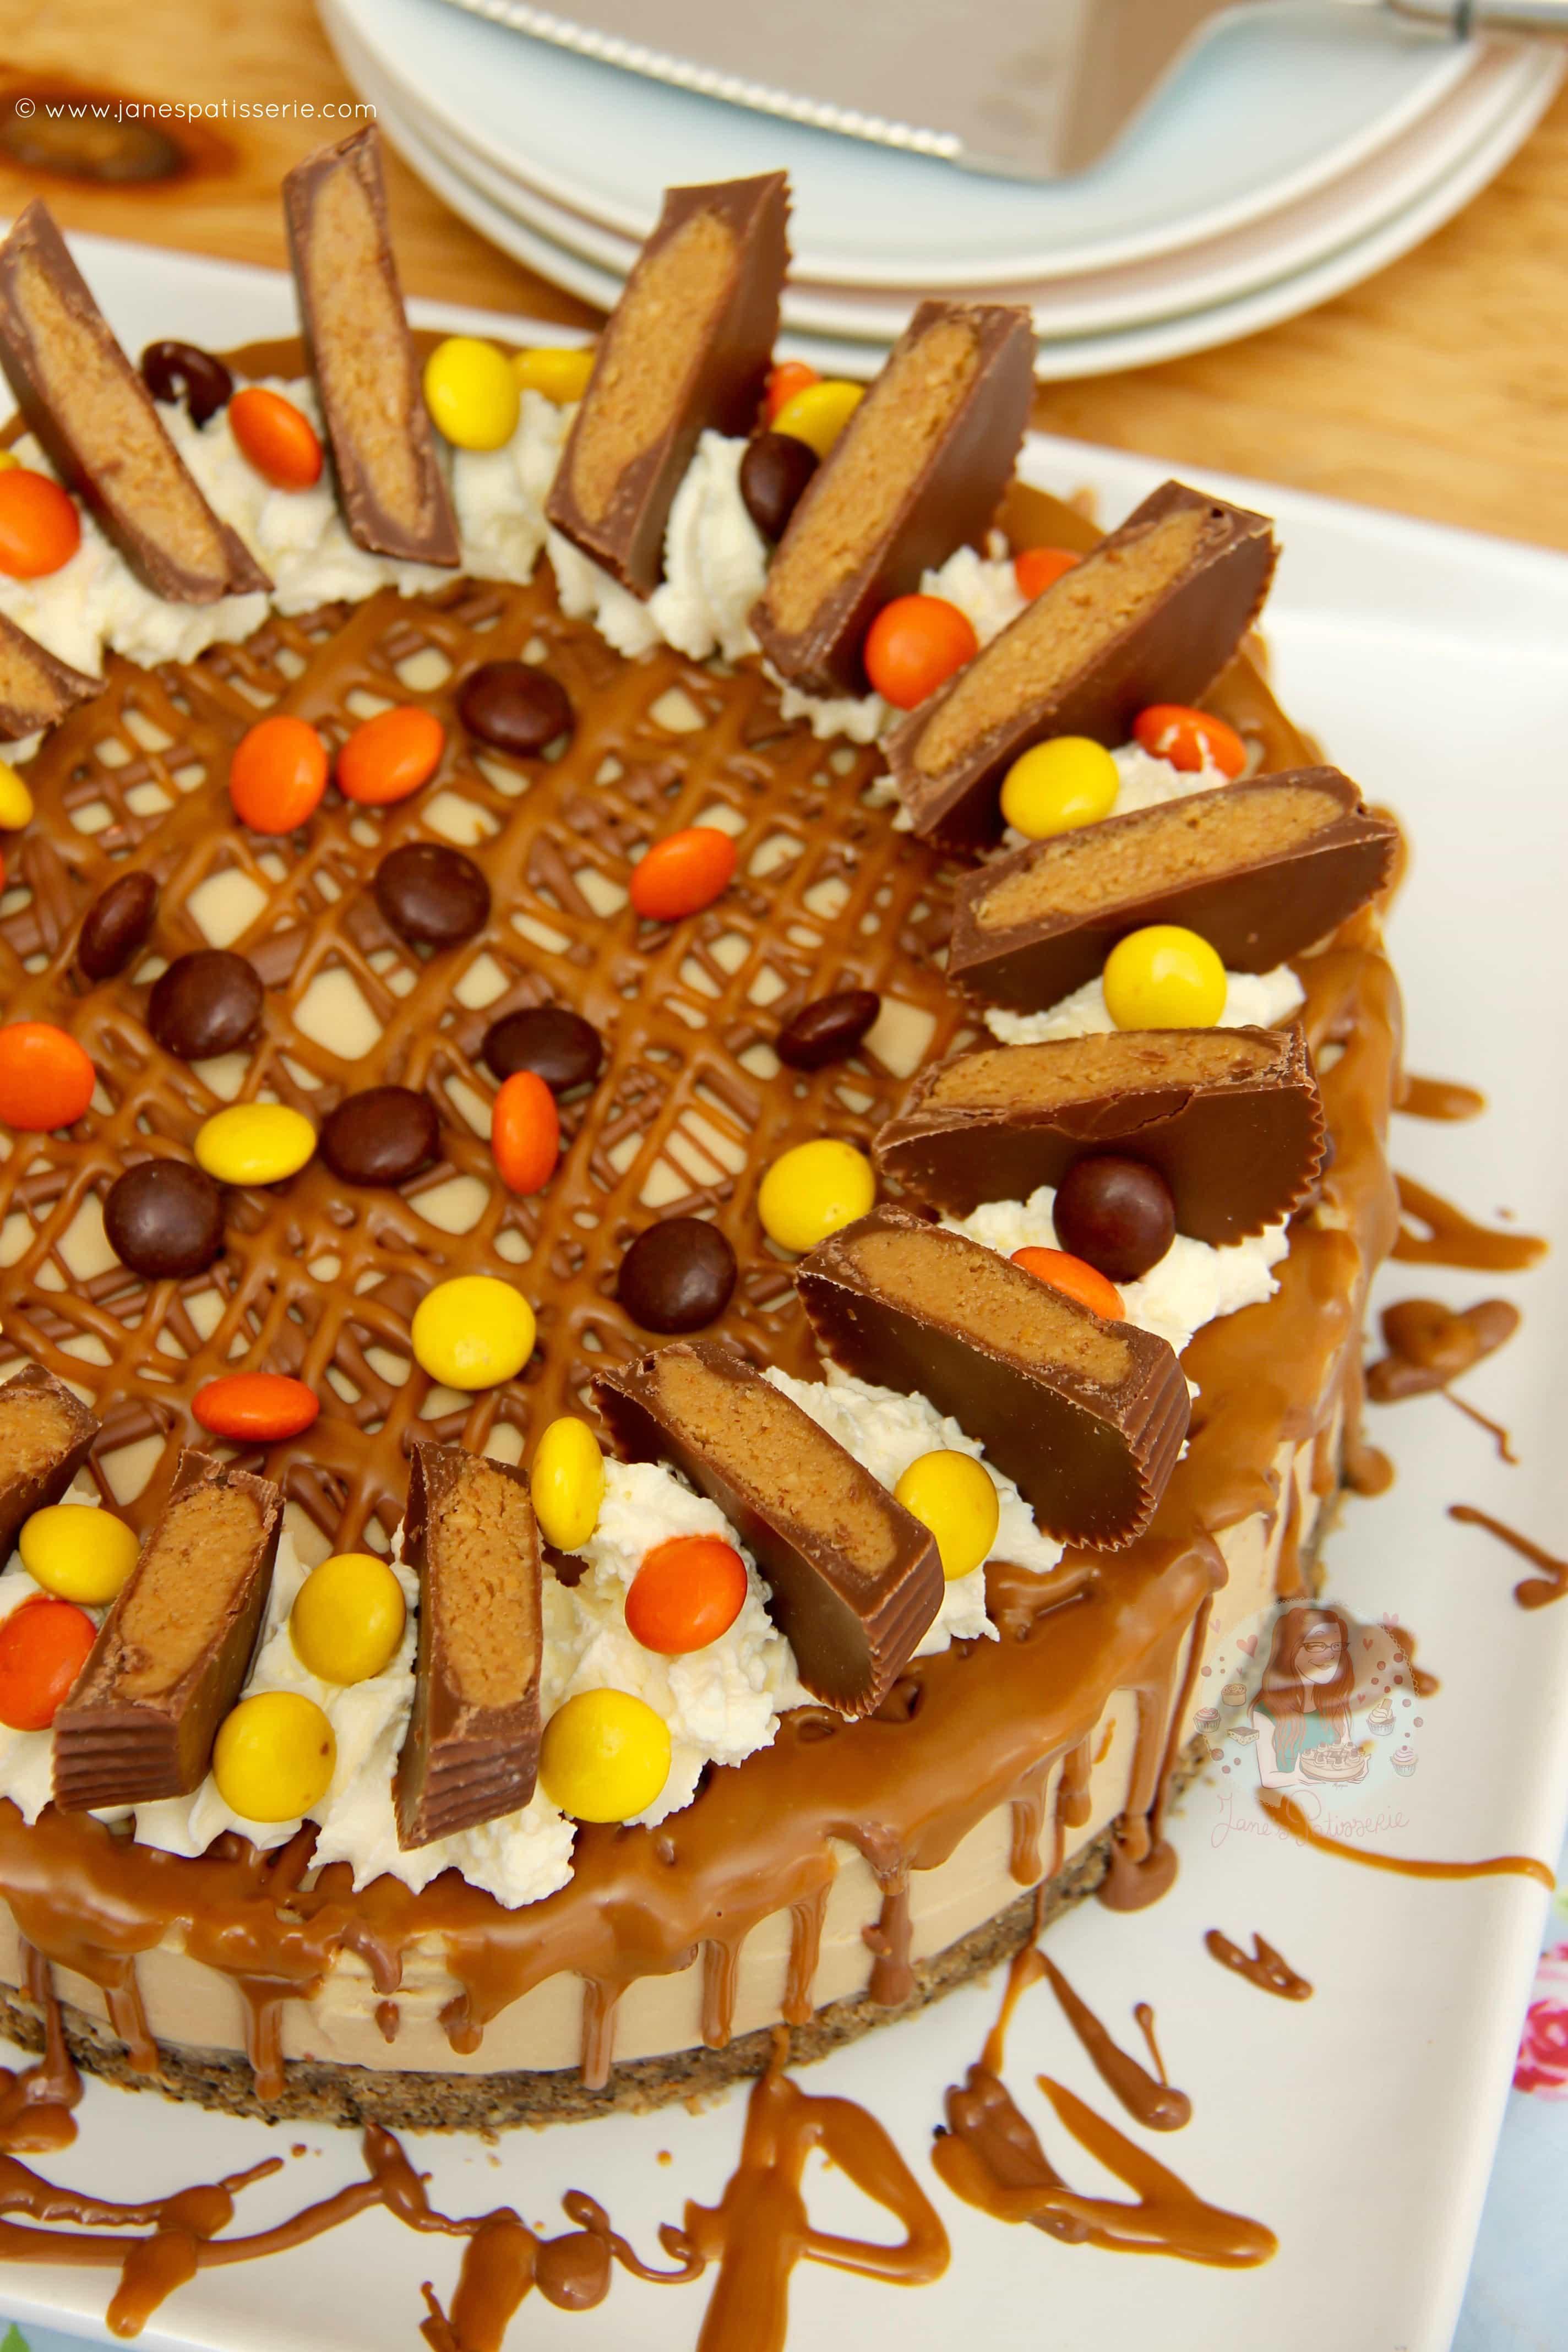 Eccezionale No-Bake Peanut Butter Cheesecake! - Jane's Patisserie TM83